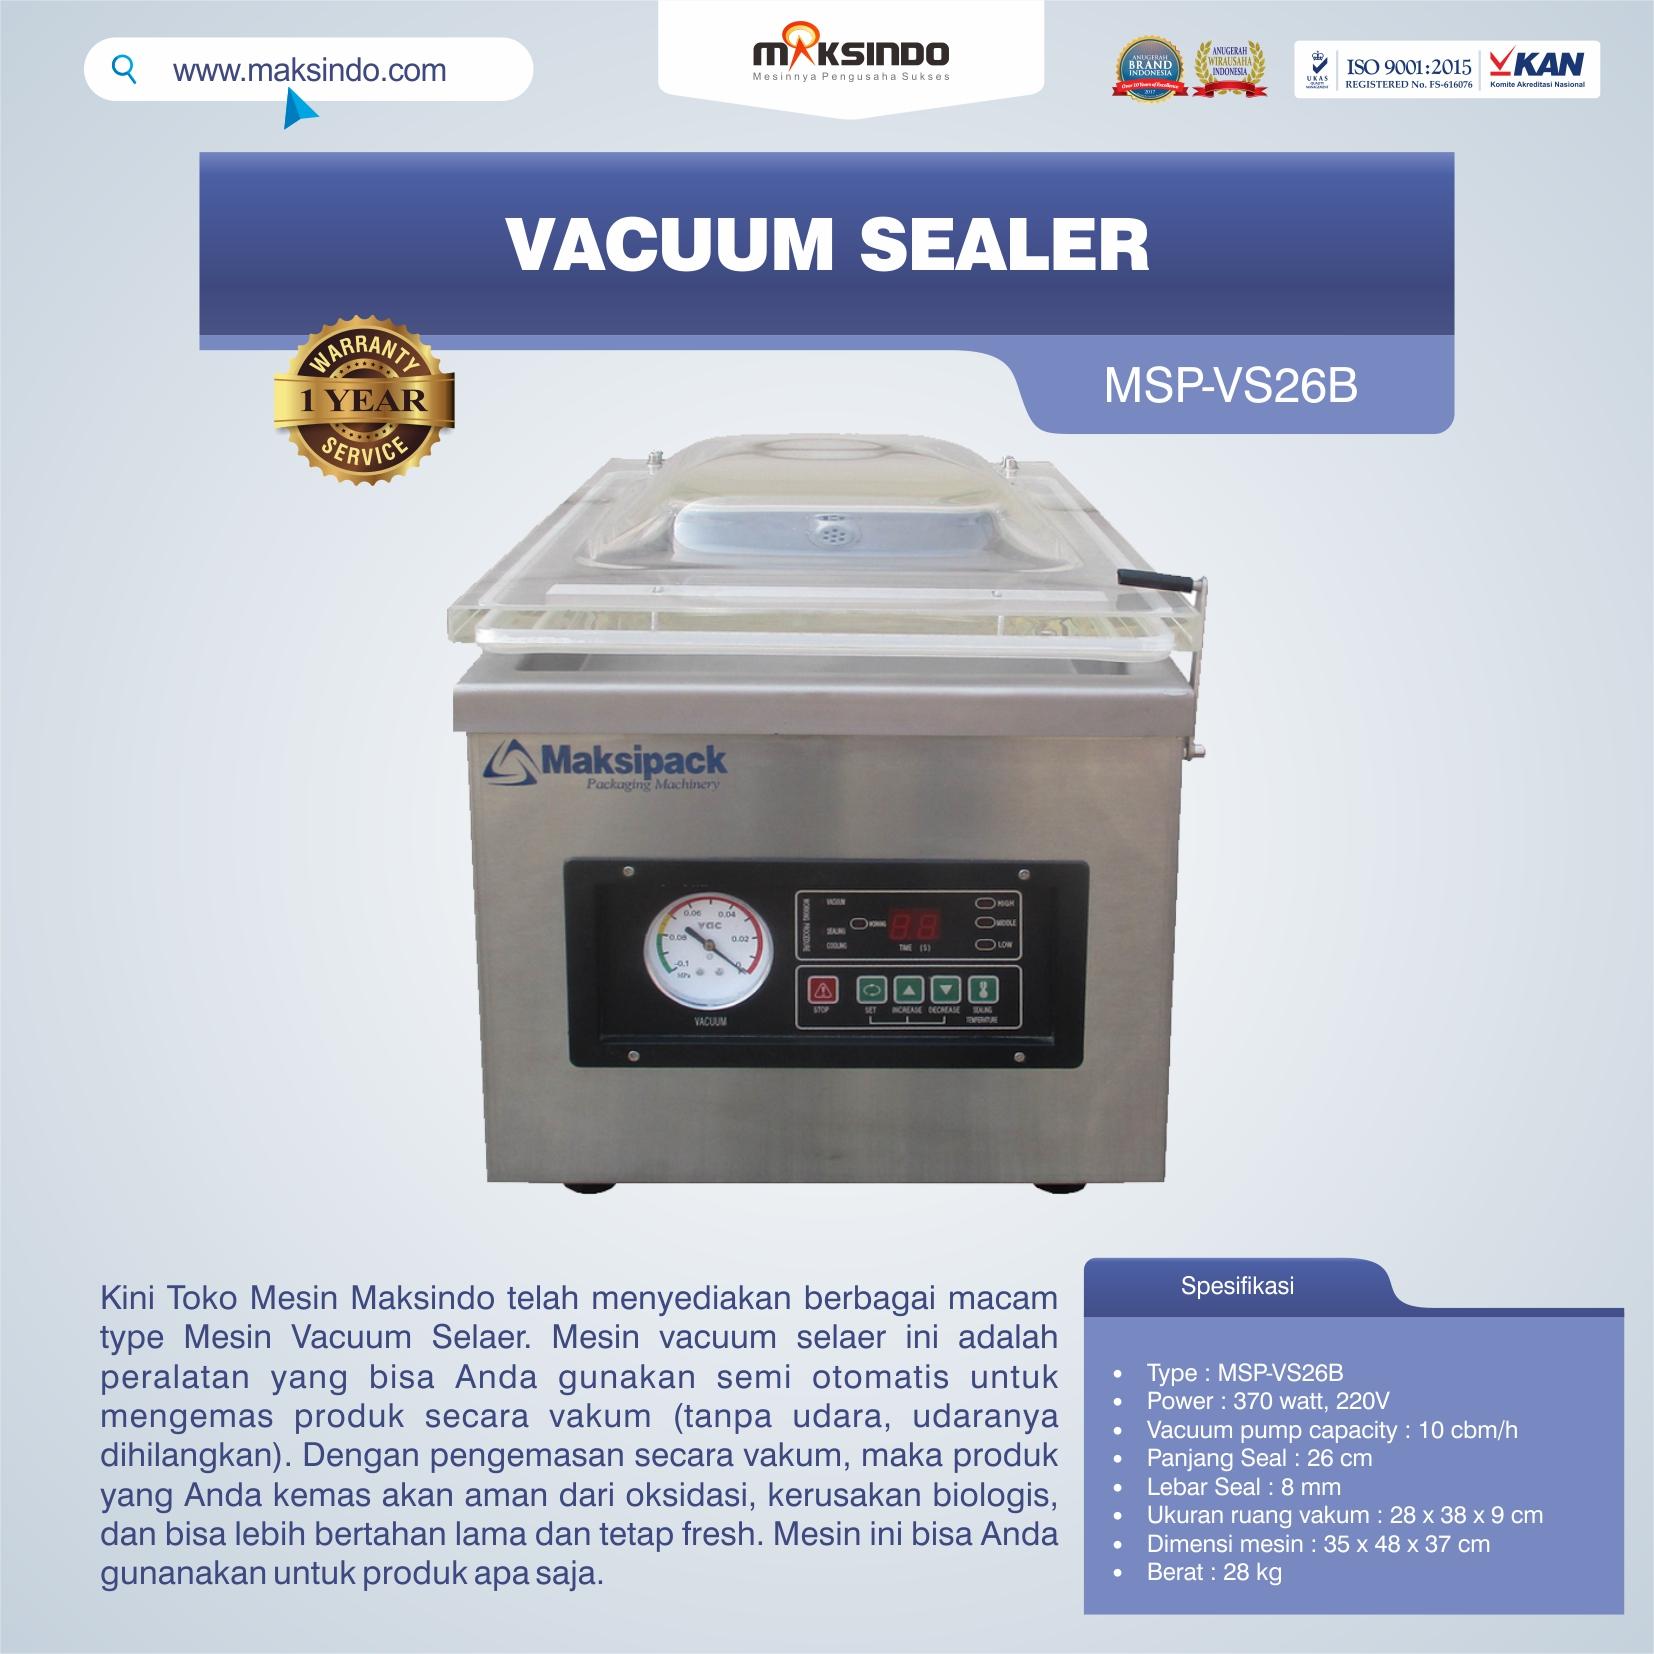 Jual Vacuum Sealer MSP-VS26B di Pekanbaru